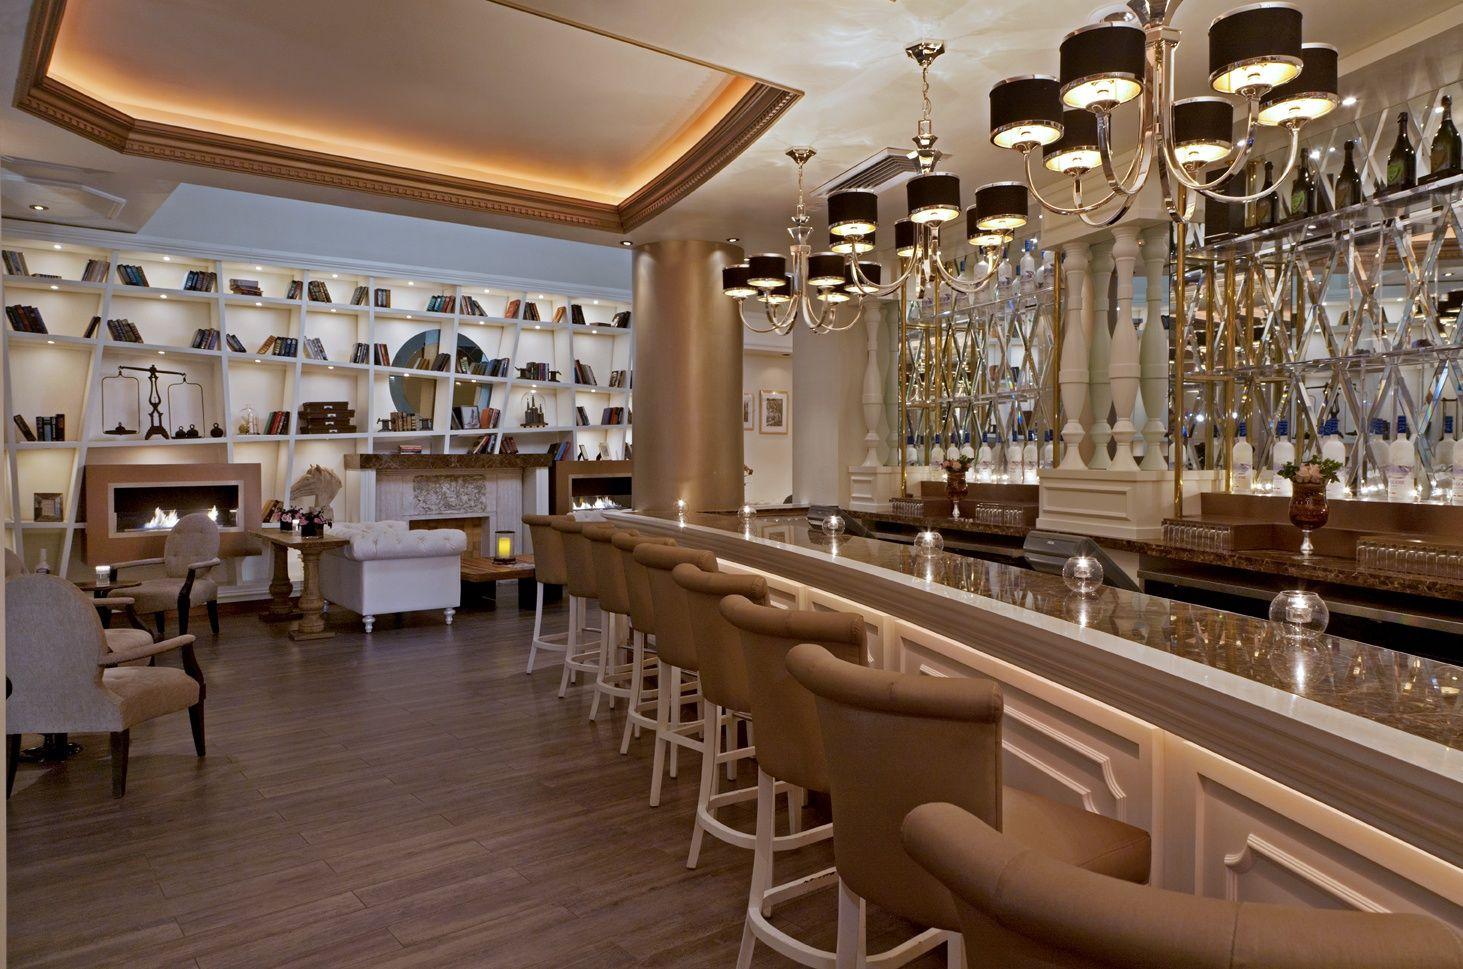 MAIN BAR INSIDE Gallery restaurant, Restaurant lounge